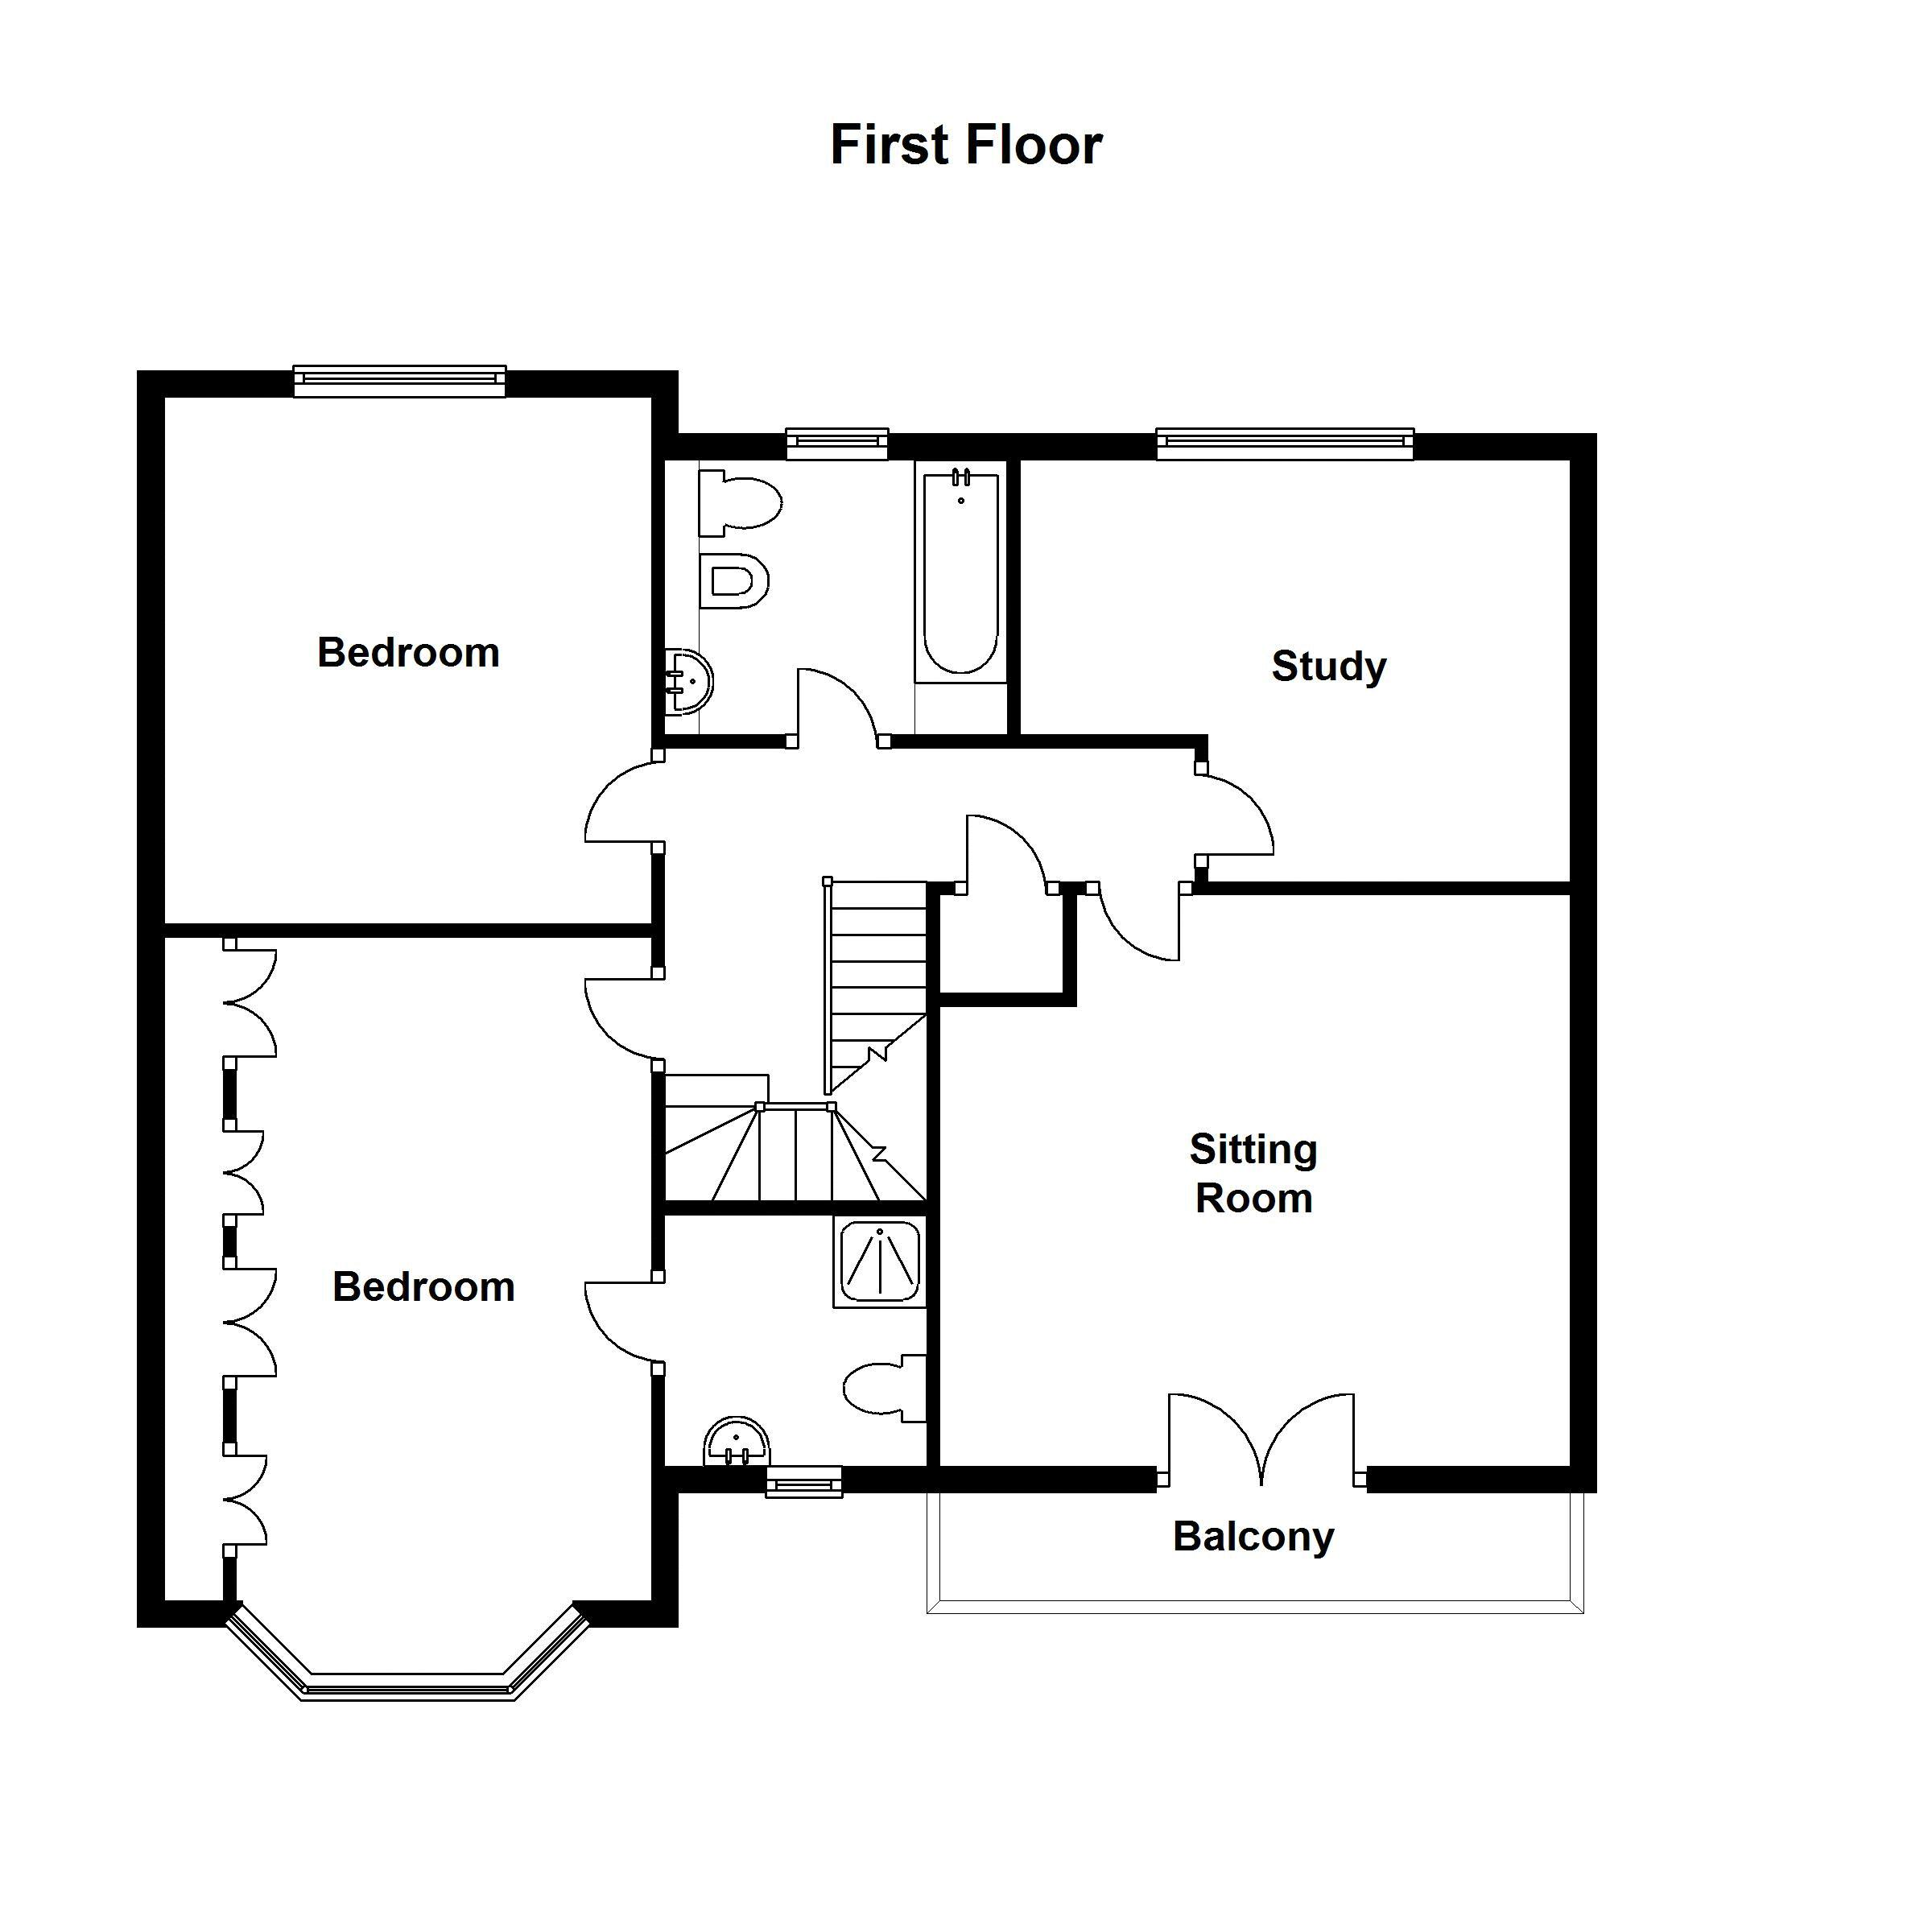 7x7 bathroom floor plans together with bathroom floor plan 7x8 further - Bed 2 Bath